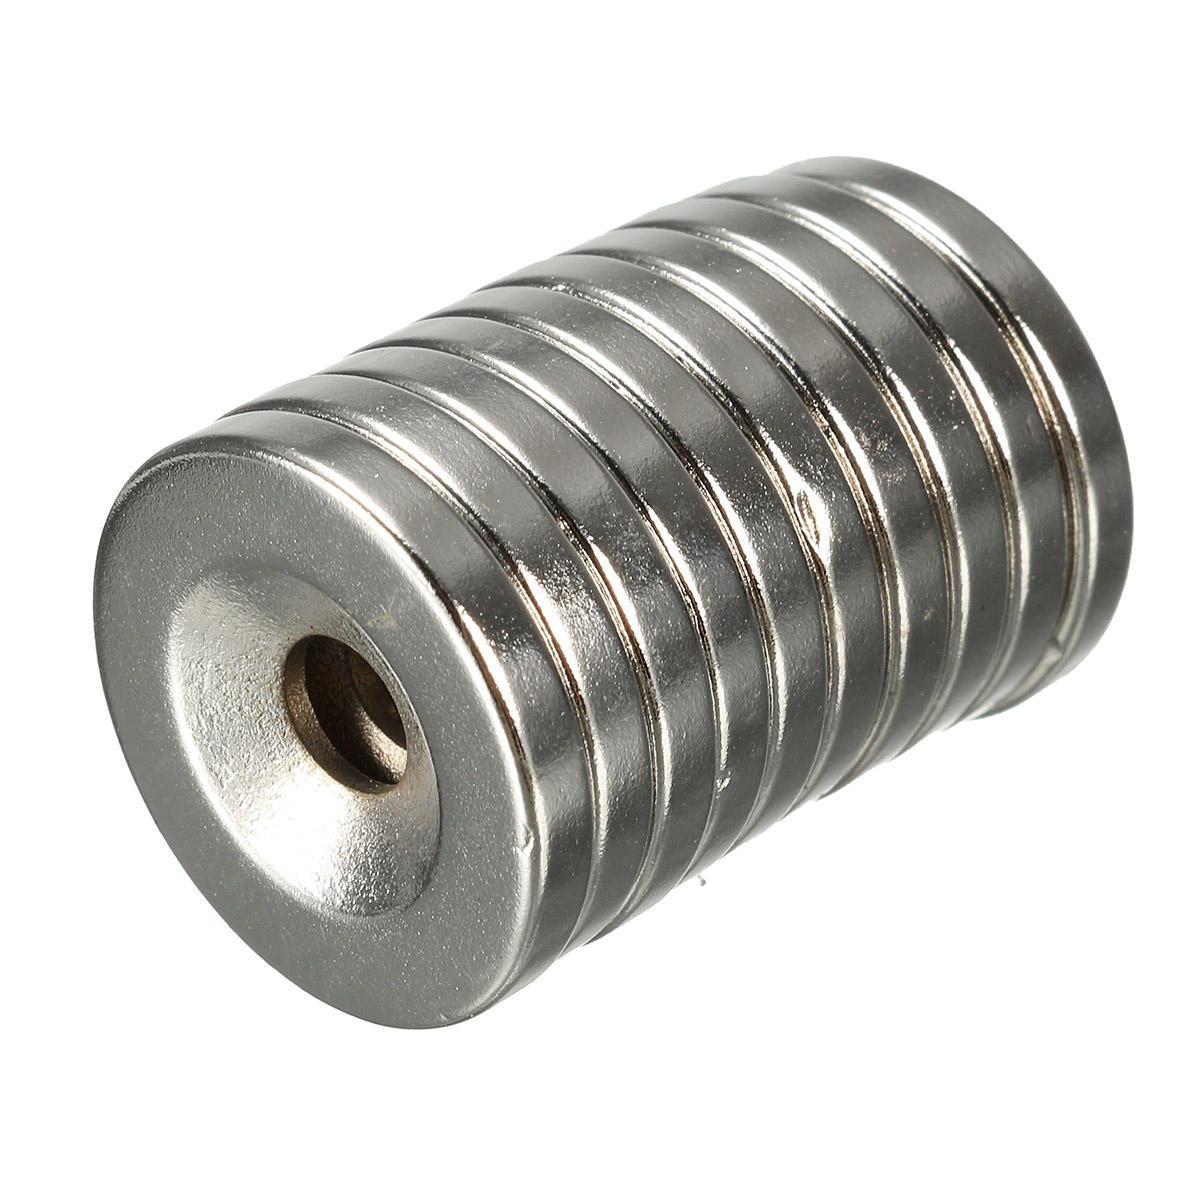 10pcs N35 20x3mm avellanados anillo imanes con 5mm Agujero fuerte imán de neodimio de disco